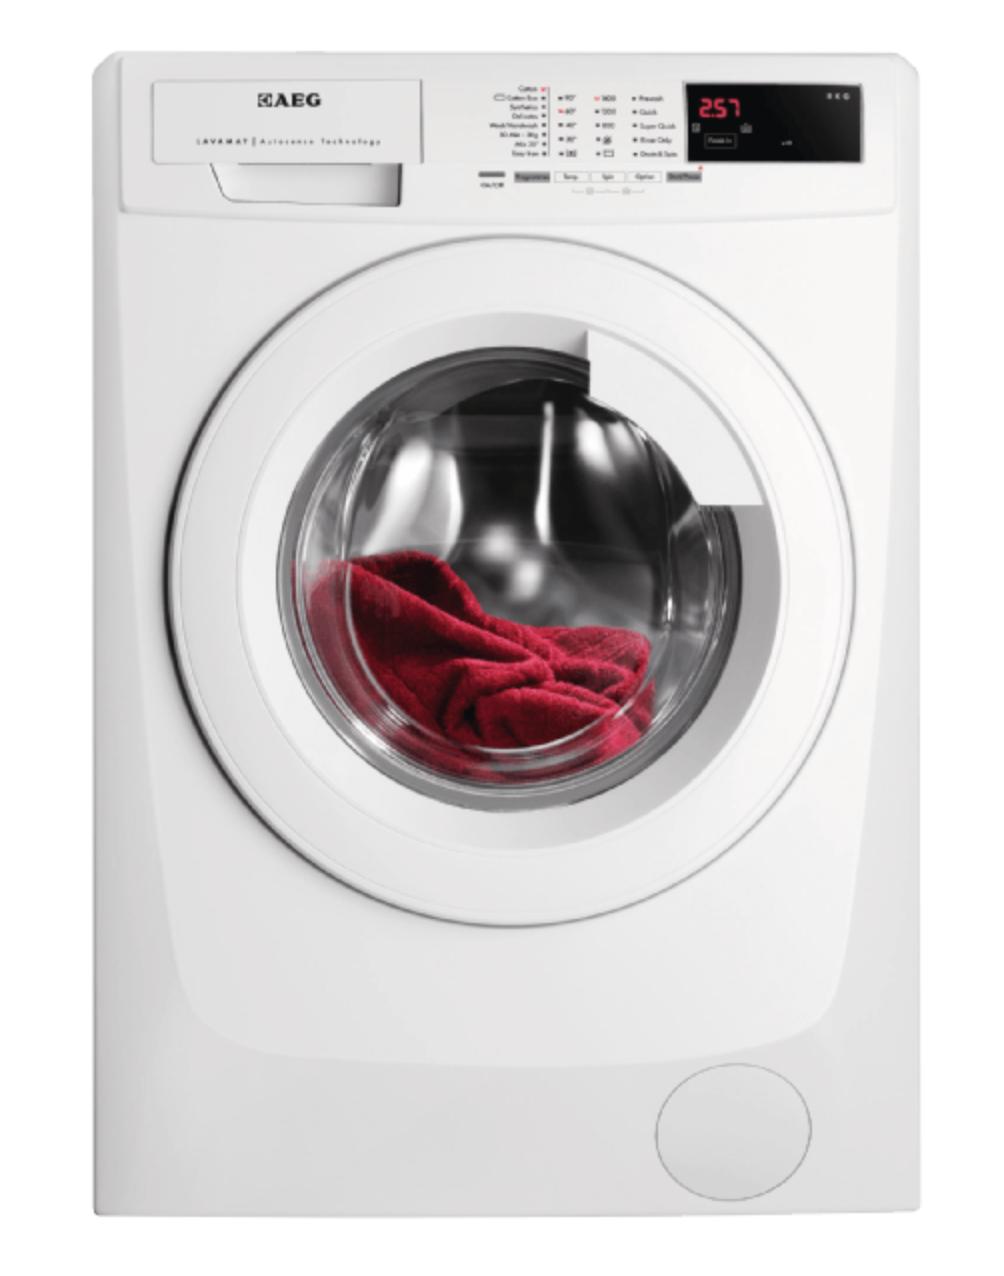 mediamarkt fr hshoppen aeg l68480fl waschmaschine 8 kg 1400 u min a nur am. Black Bedroom Furniture Sets. Home Design Ideas